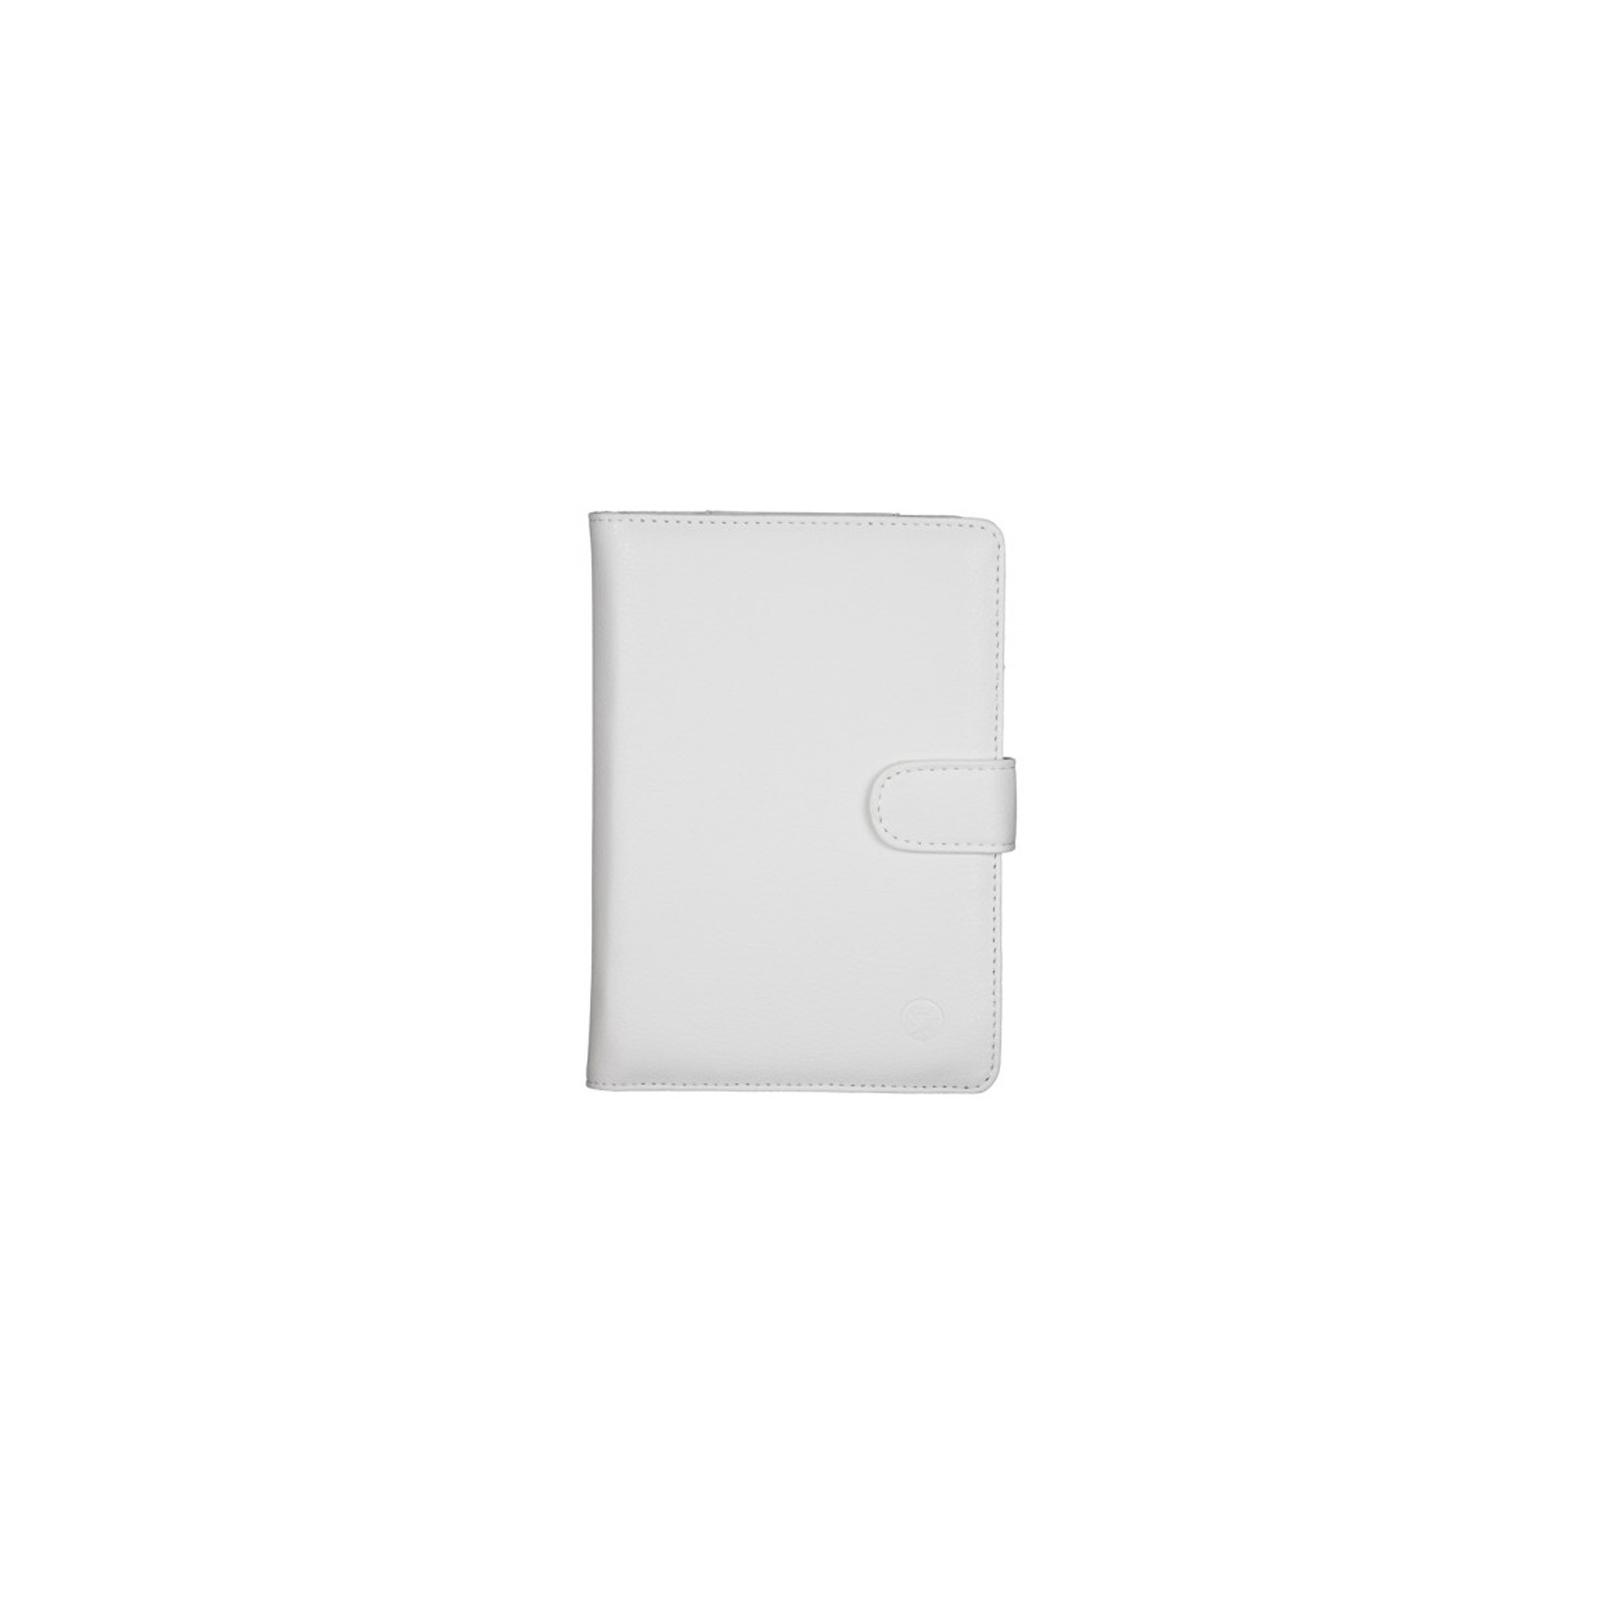 Чехол для электронной книги AirOn для PocketBook 622/623 Touch (white) (6946795860013)